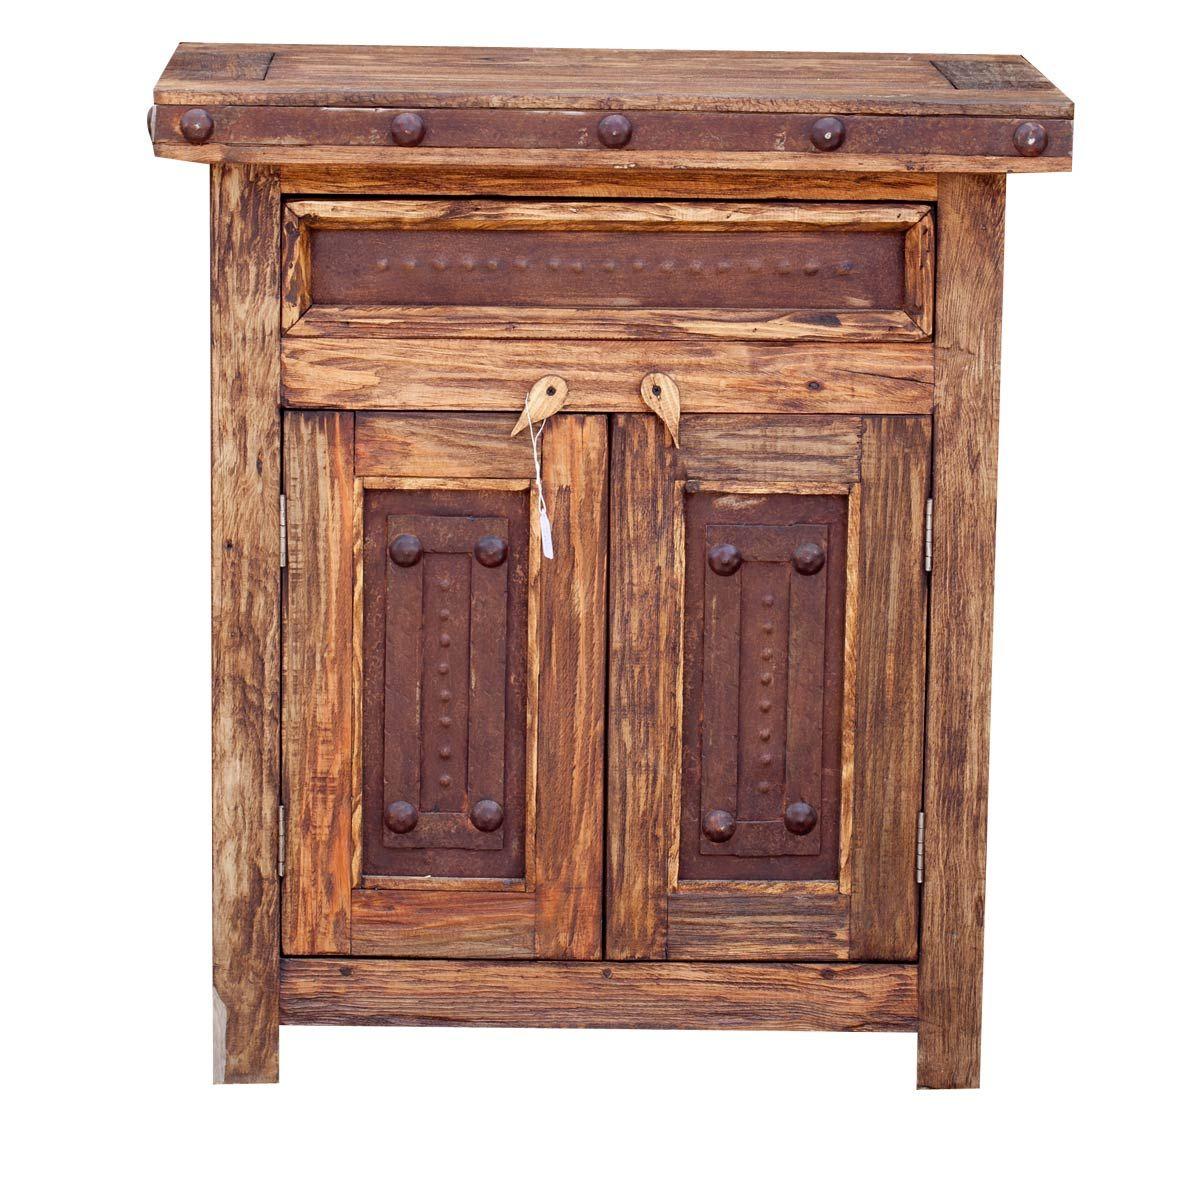 Cobre Mexican Vanity | Reclaimed Wood Furniture | Texas Rustic Furniture |  Mexican Furniture